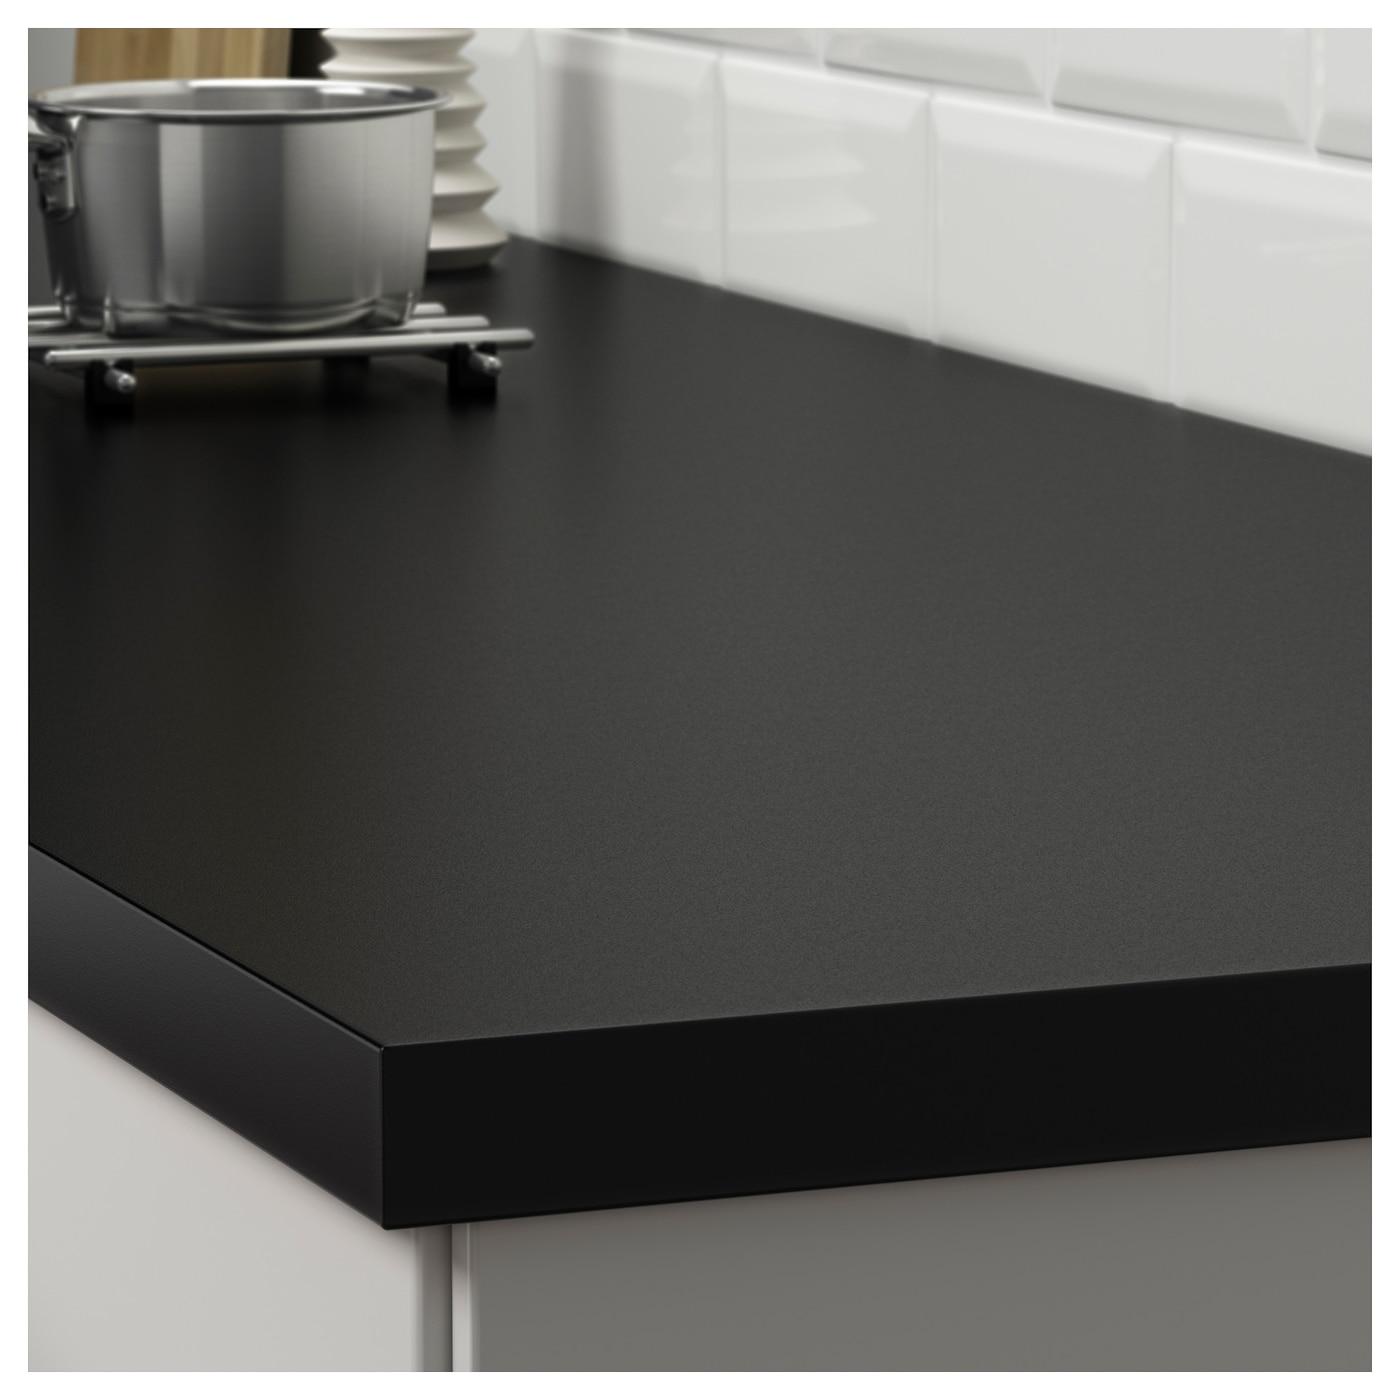 s ljan plan de travail sur mesure noir stratifi 63 6 125x3 8 cm ikea. Black Bedroom Furniture Sets. Home Design Ideas